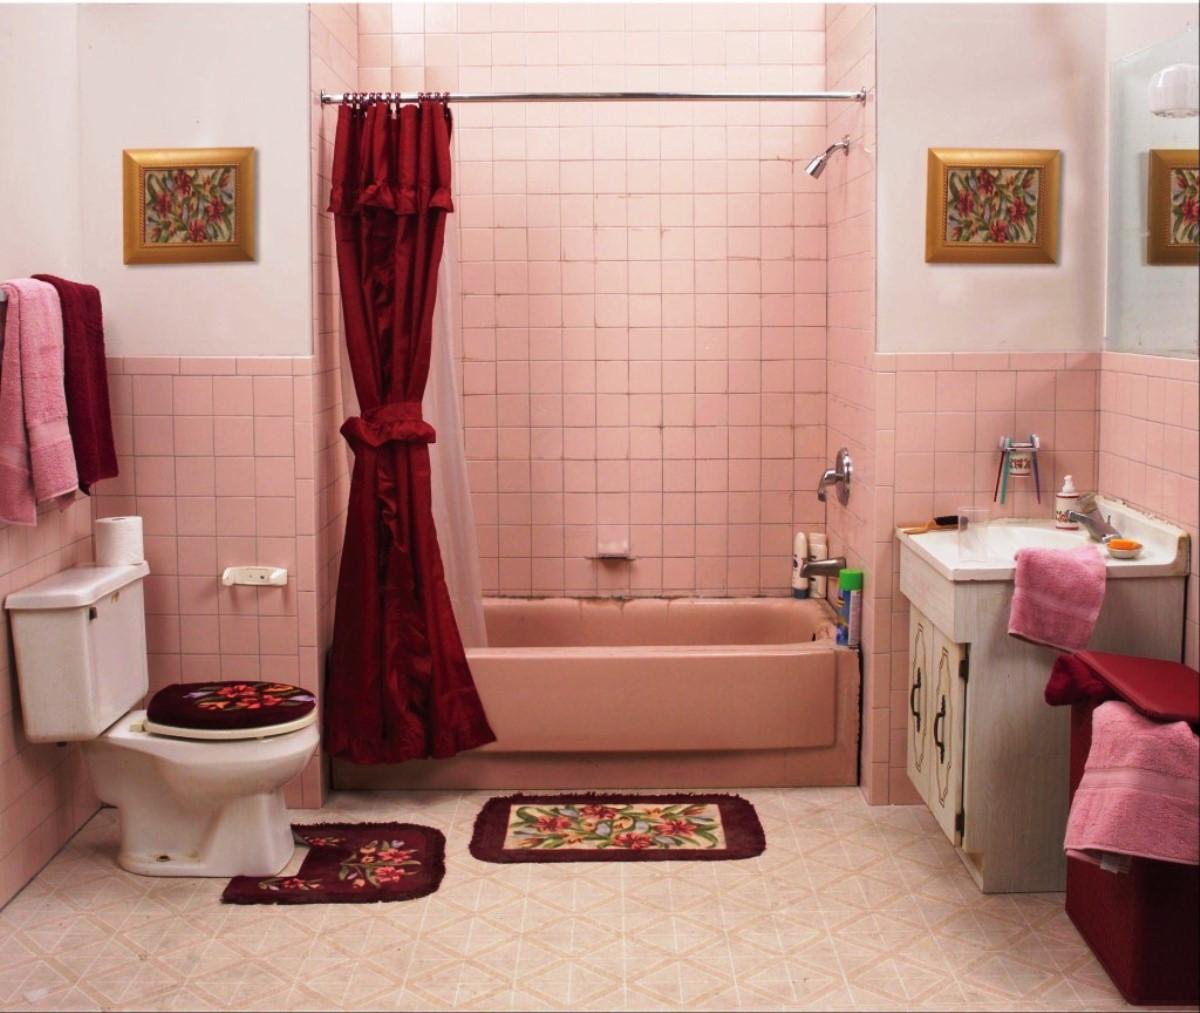 Cute Bathroom Ideas For Apartments: Cute Bathroom Ideas For Pleasant Bath Experiences